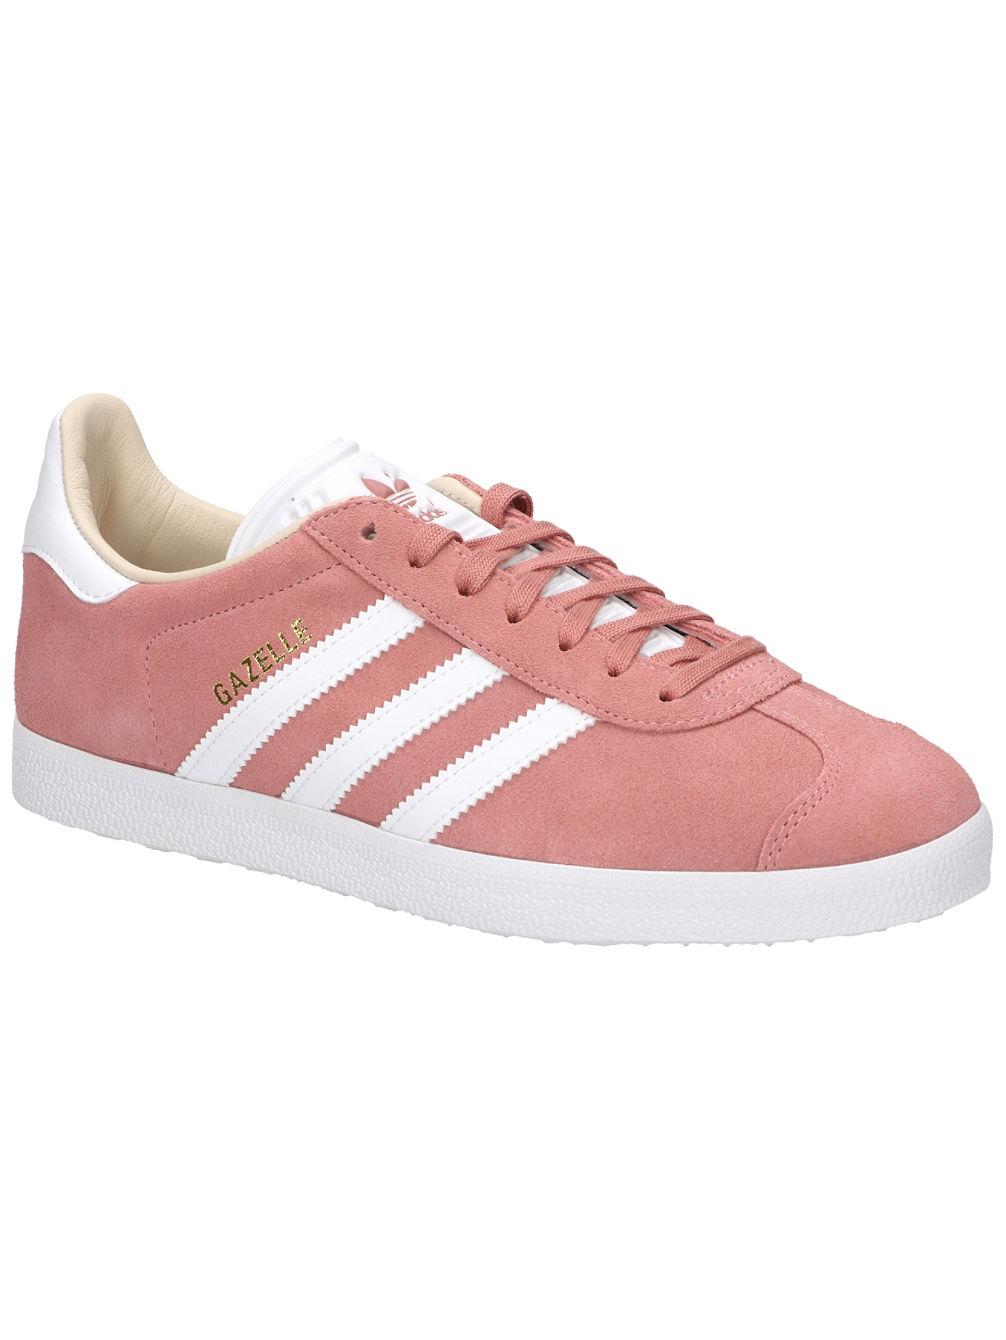 sports shoes b746c 60261 Buy adidas Originals Gazelle W Sneakers Women online at Blue Tomato